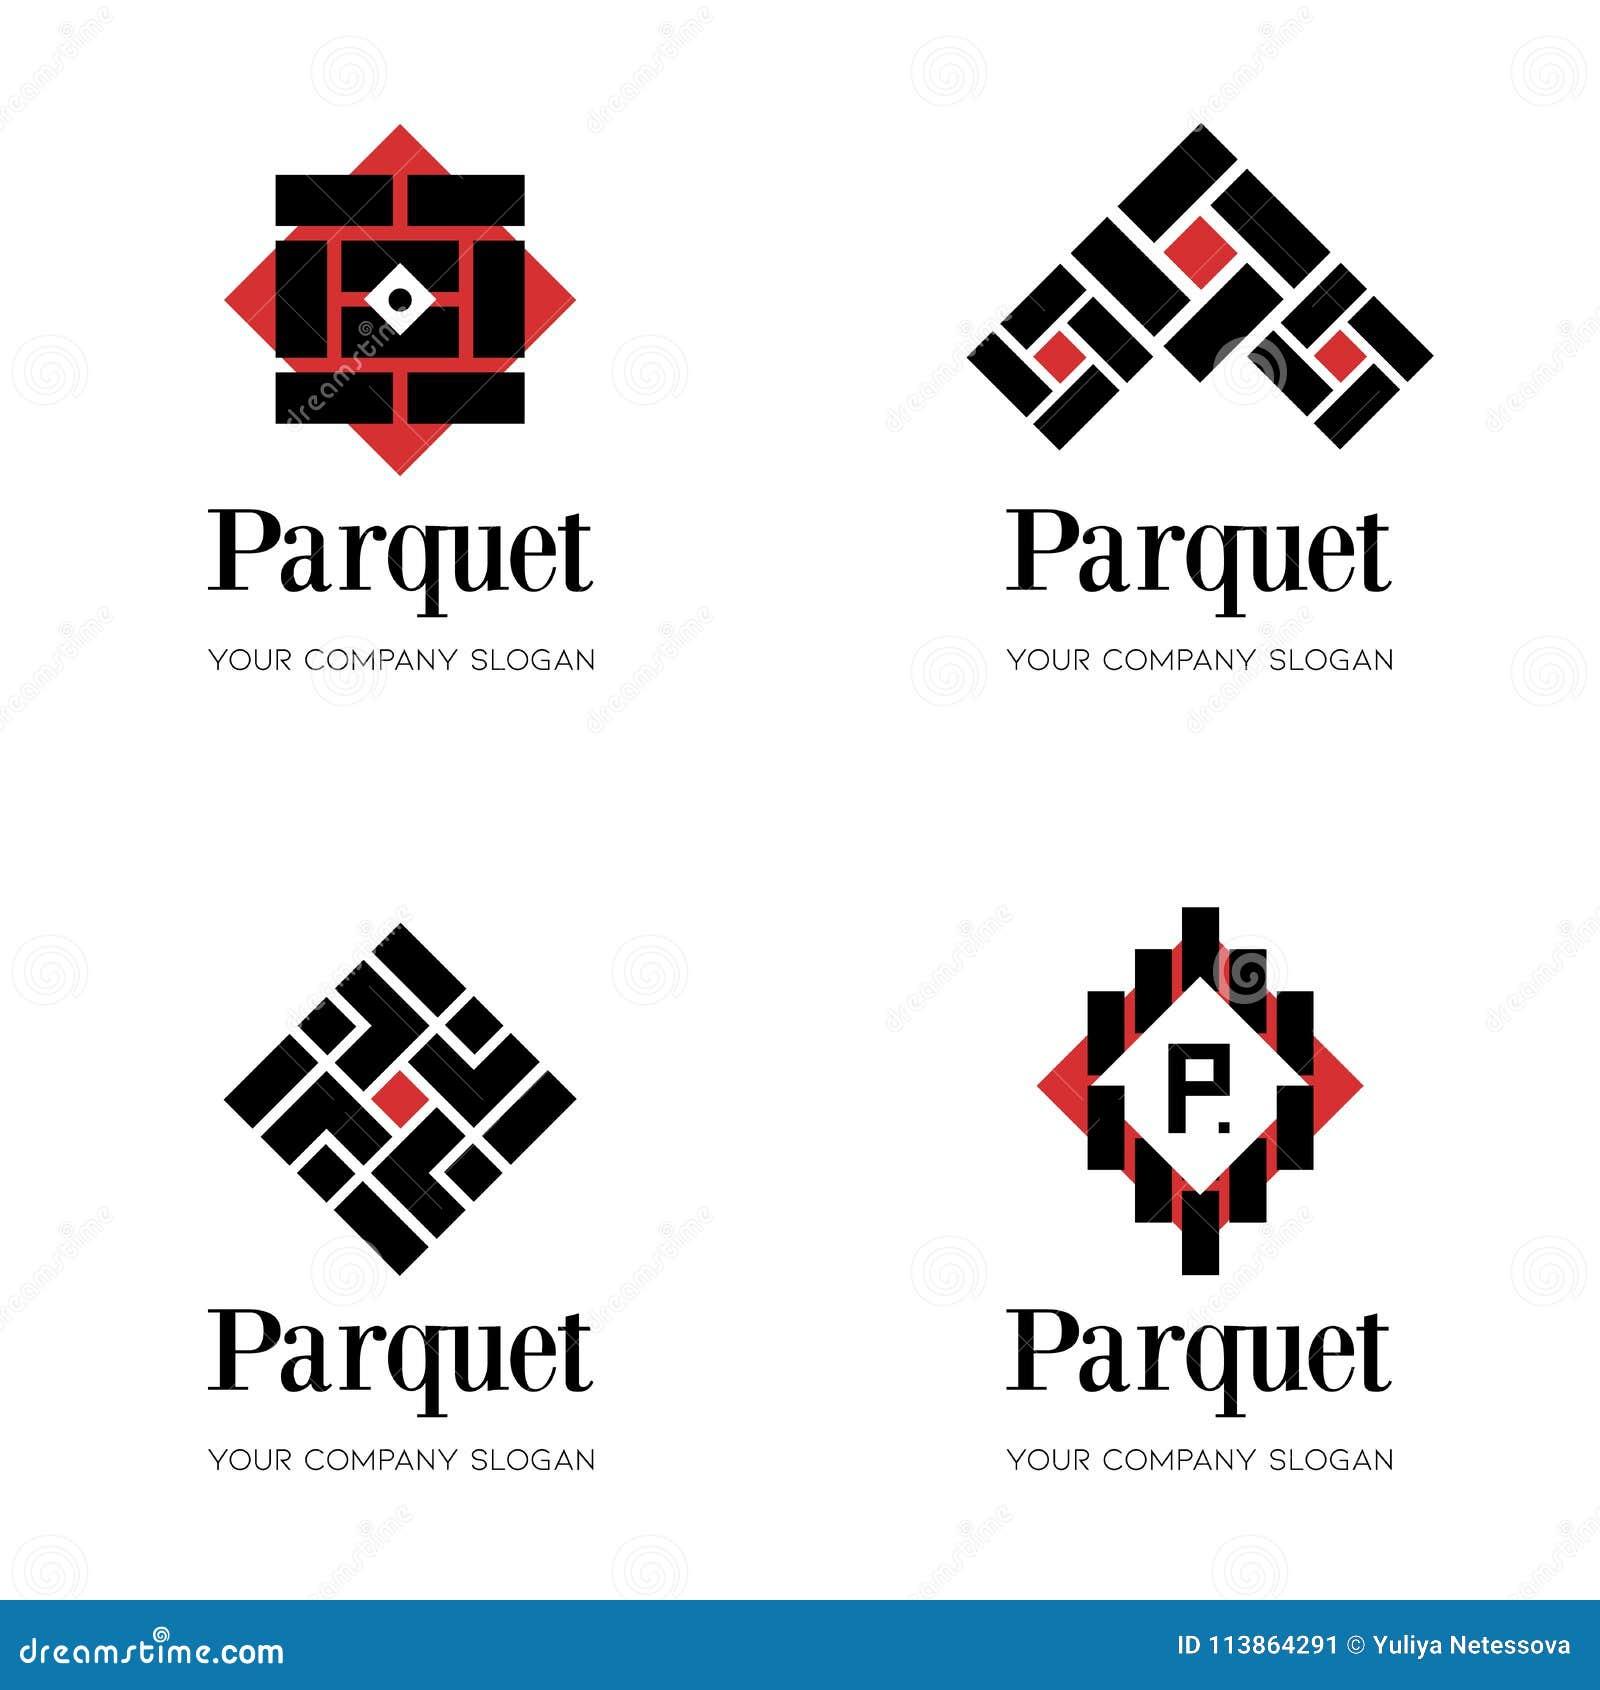 Parquet logo template. Flooring logo template. Abstract logo design templates for parquet company, flooring company